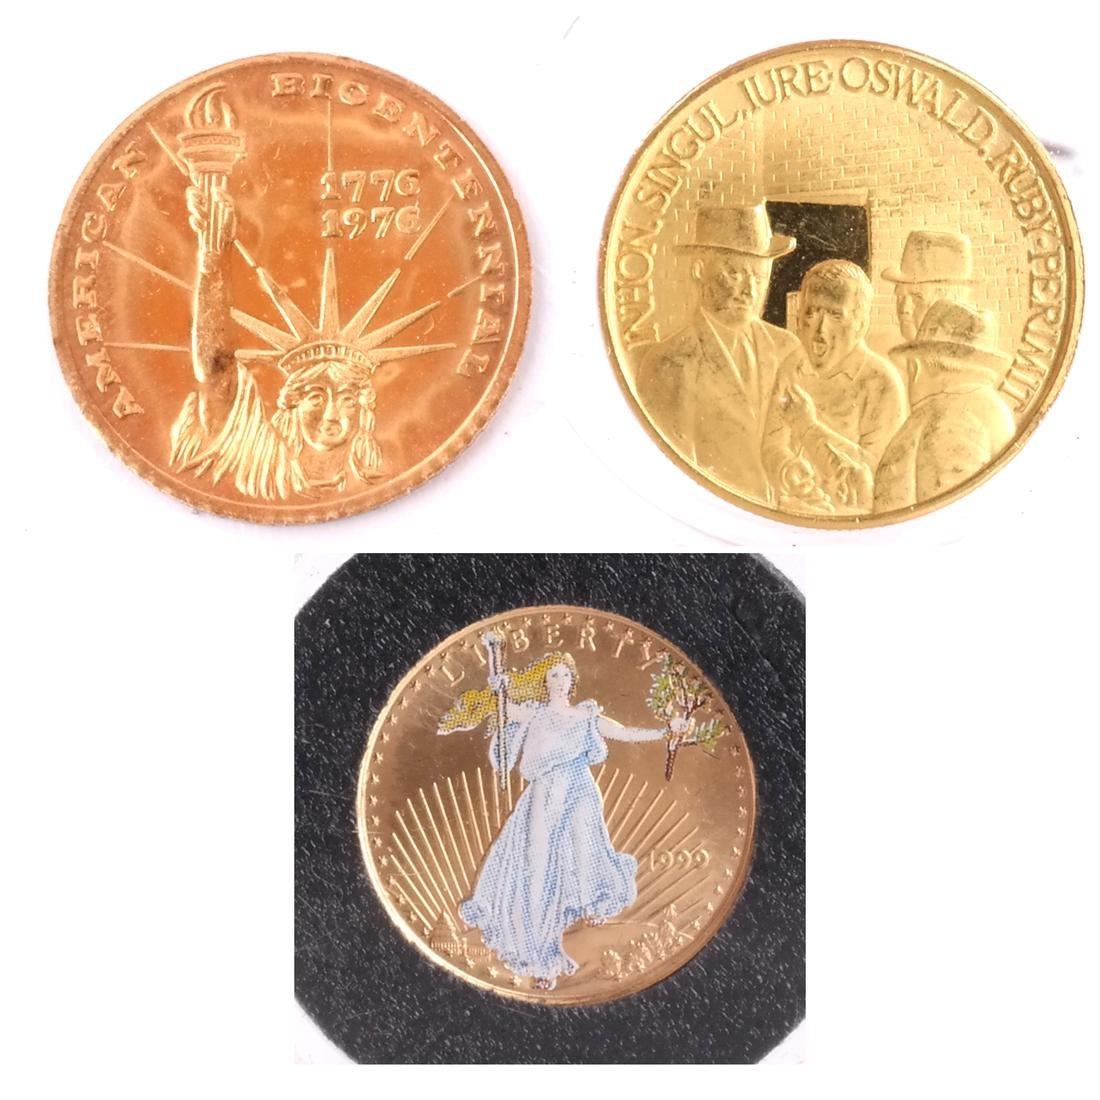 1999 Gold Eagle, Bicentennial, Kennedy